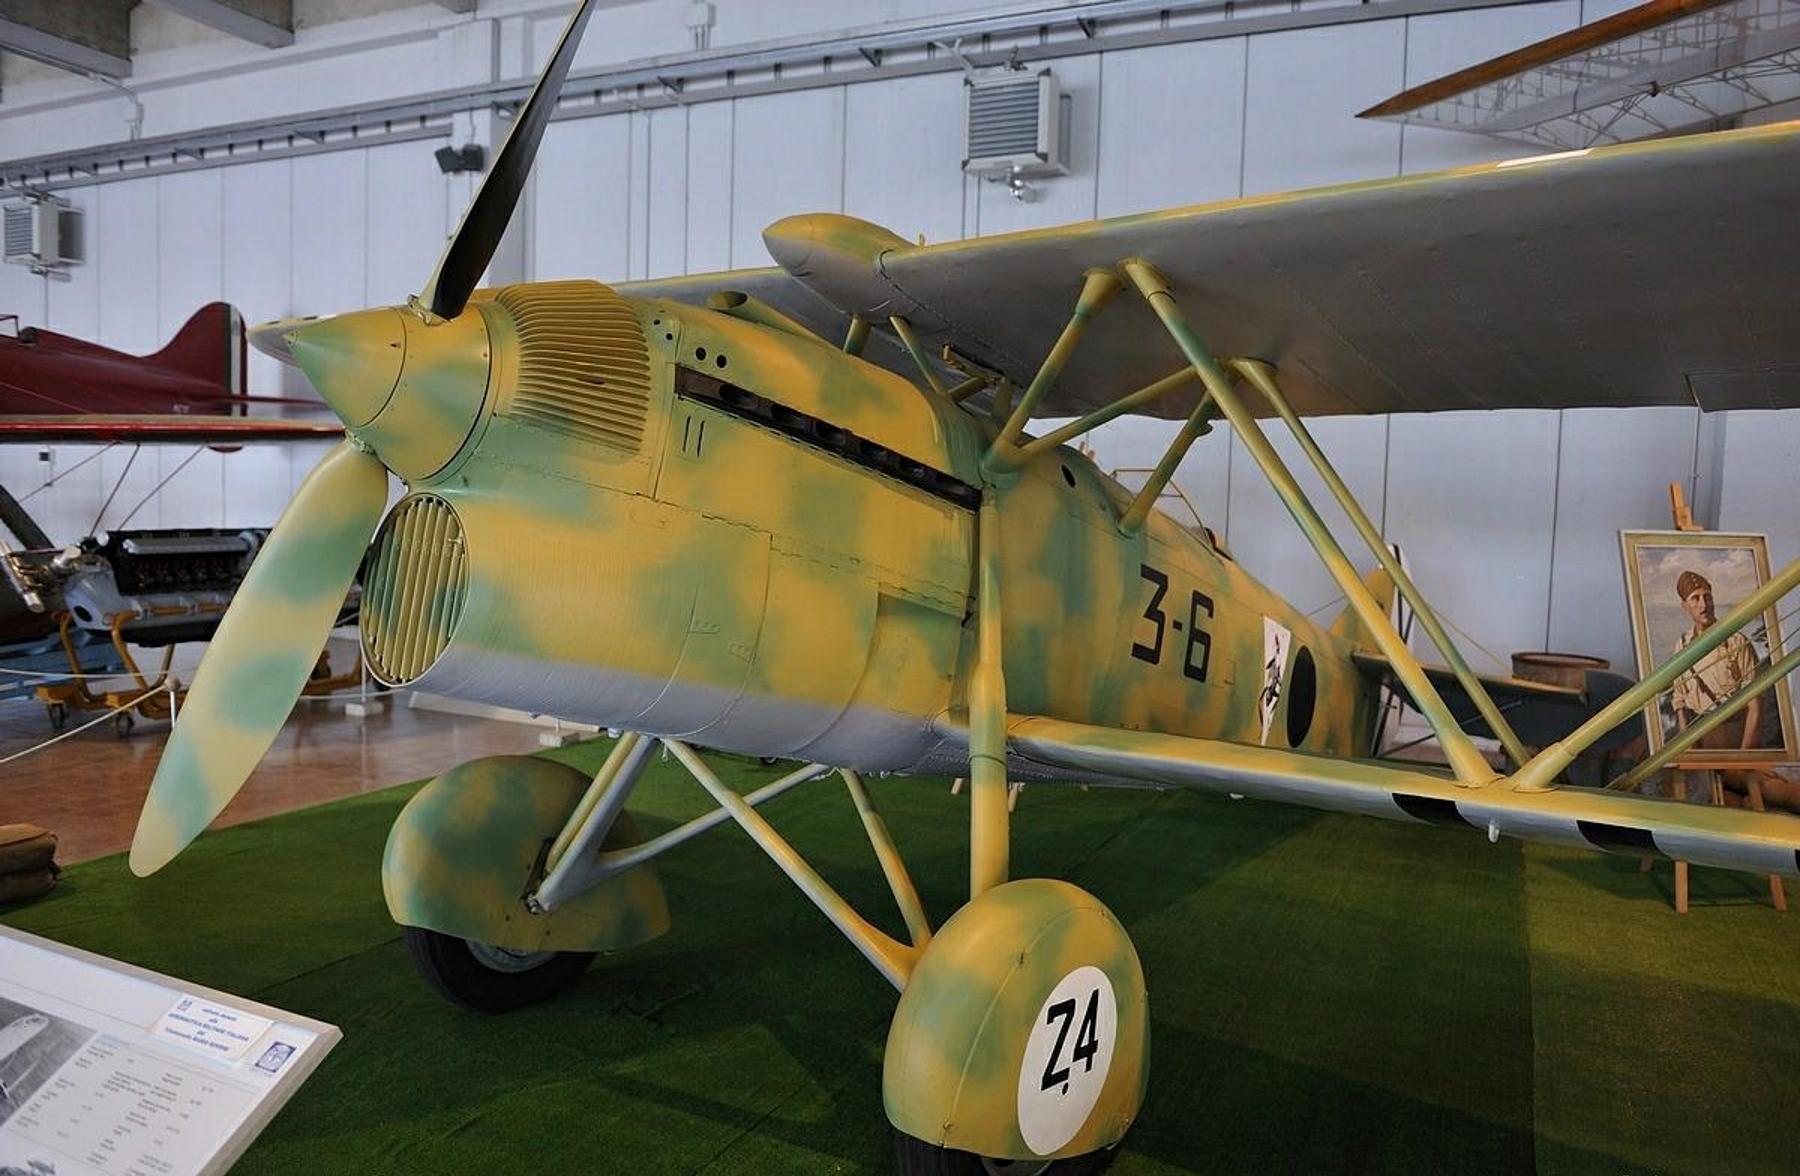 Fiata CR.32